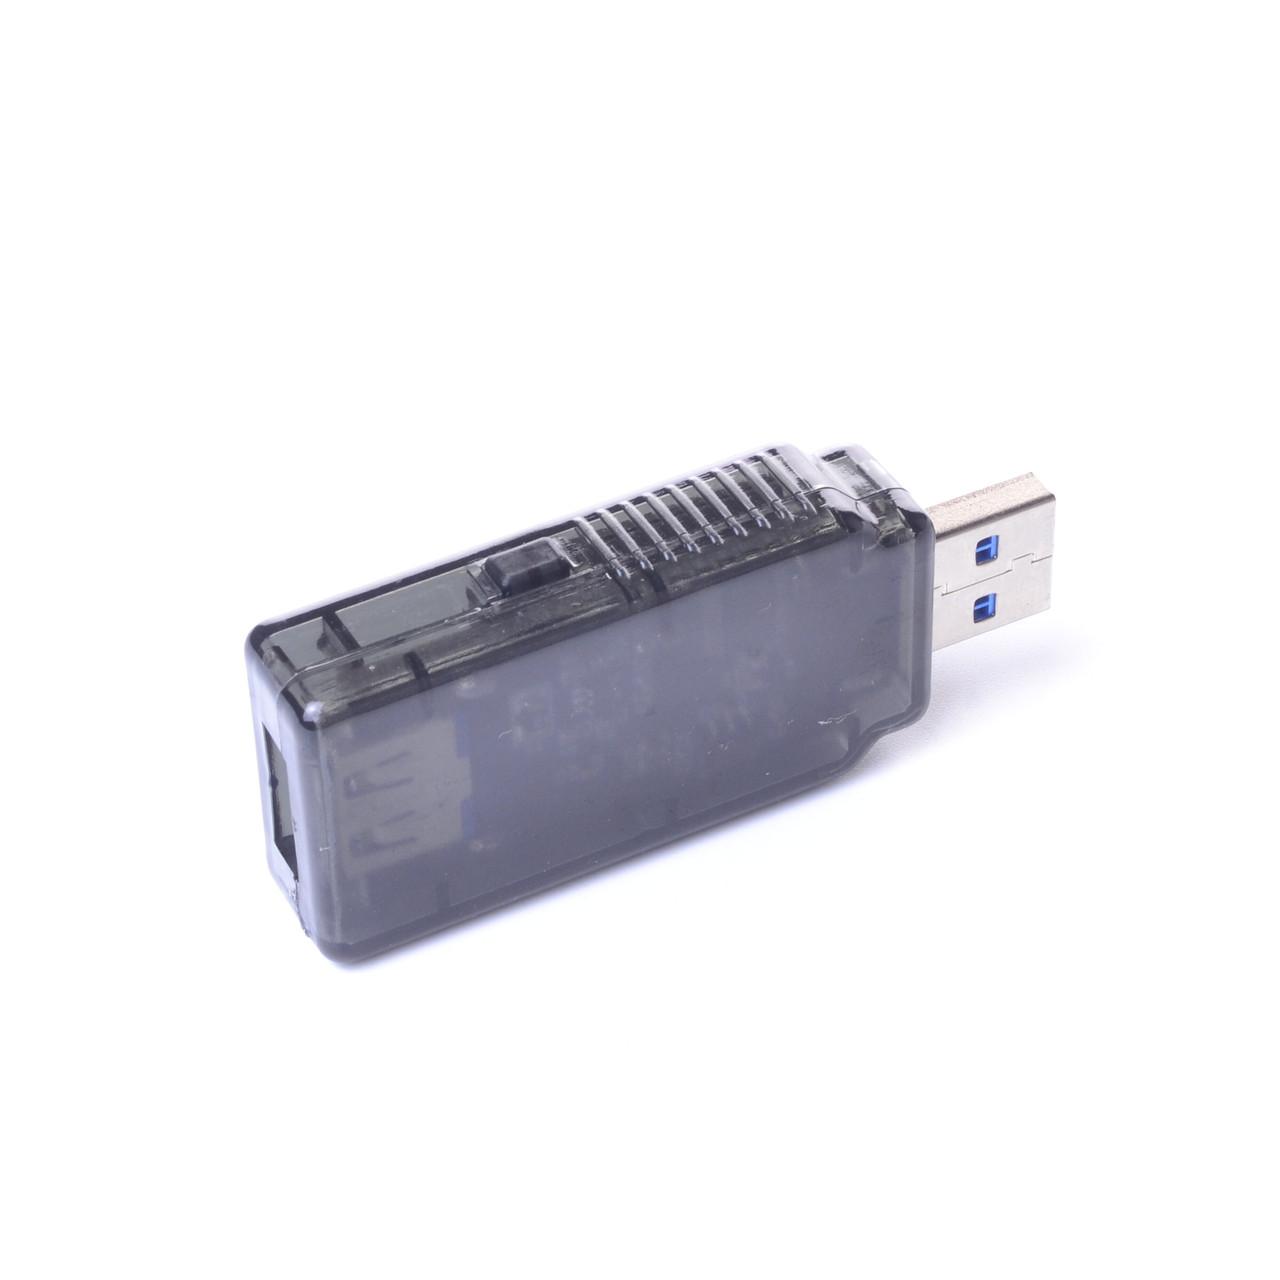 USB тестер FNB08 32V 96W USB3.0 с ваттметром, амперметром, и измерением ёмкости батарей